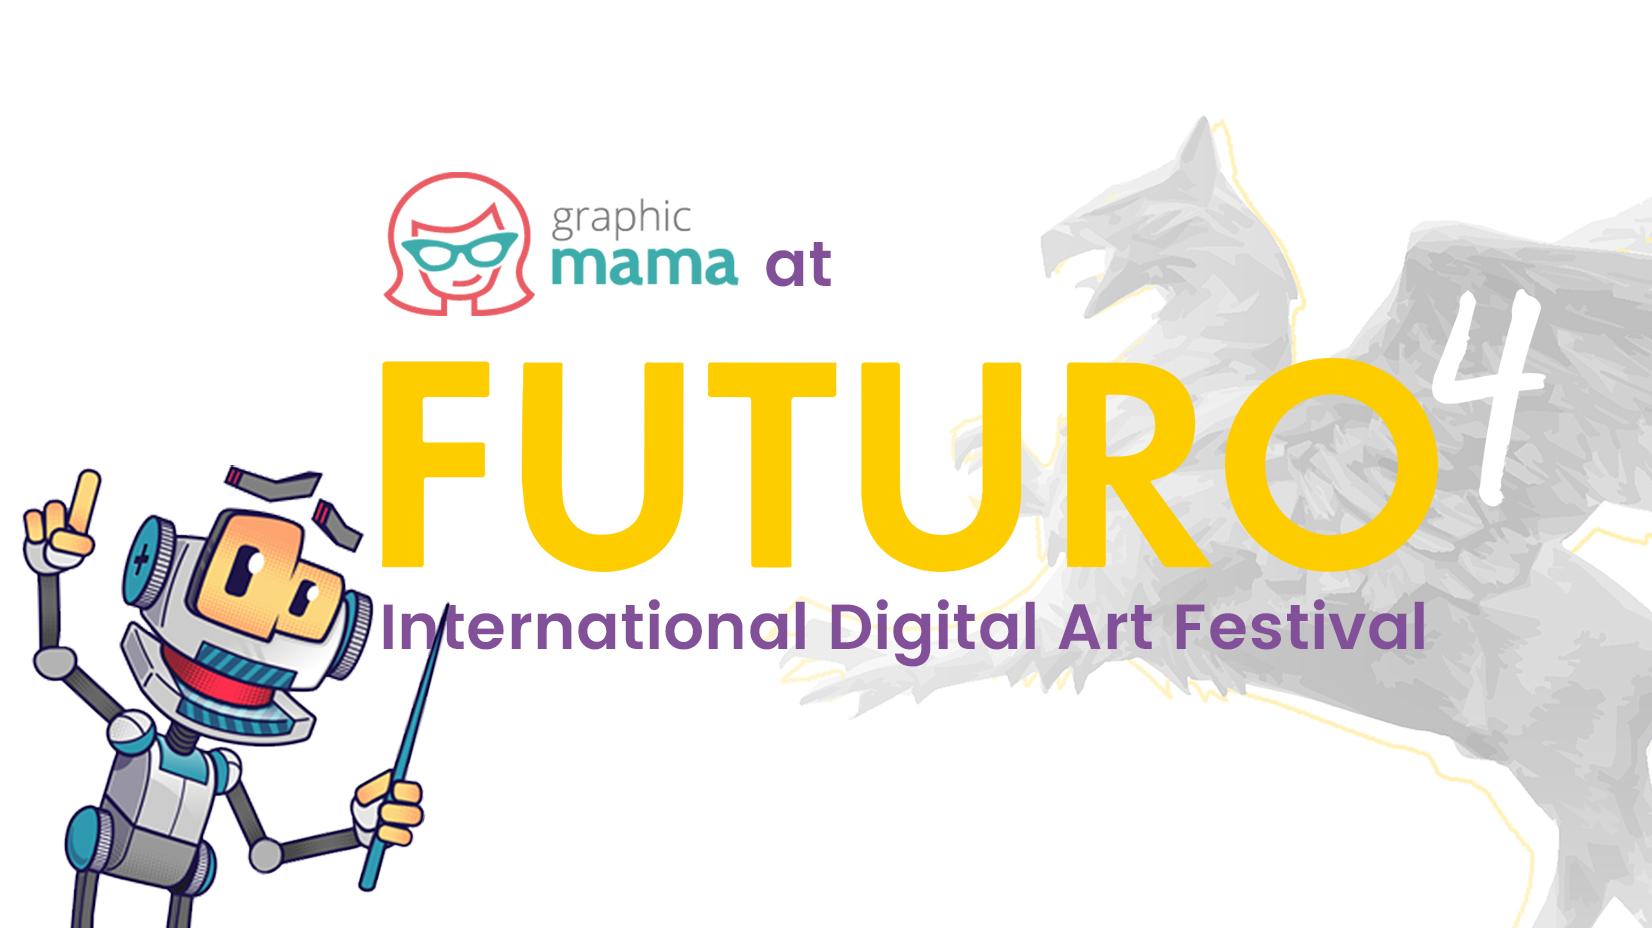 GraphicMama presents Character Animator Puppets at Futuro Festival